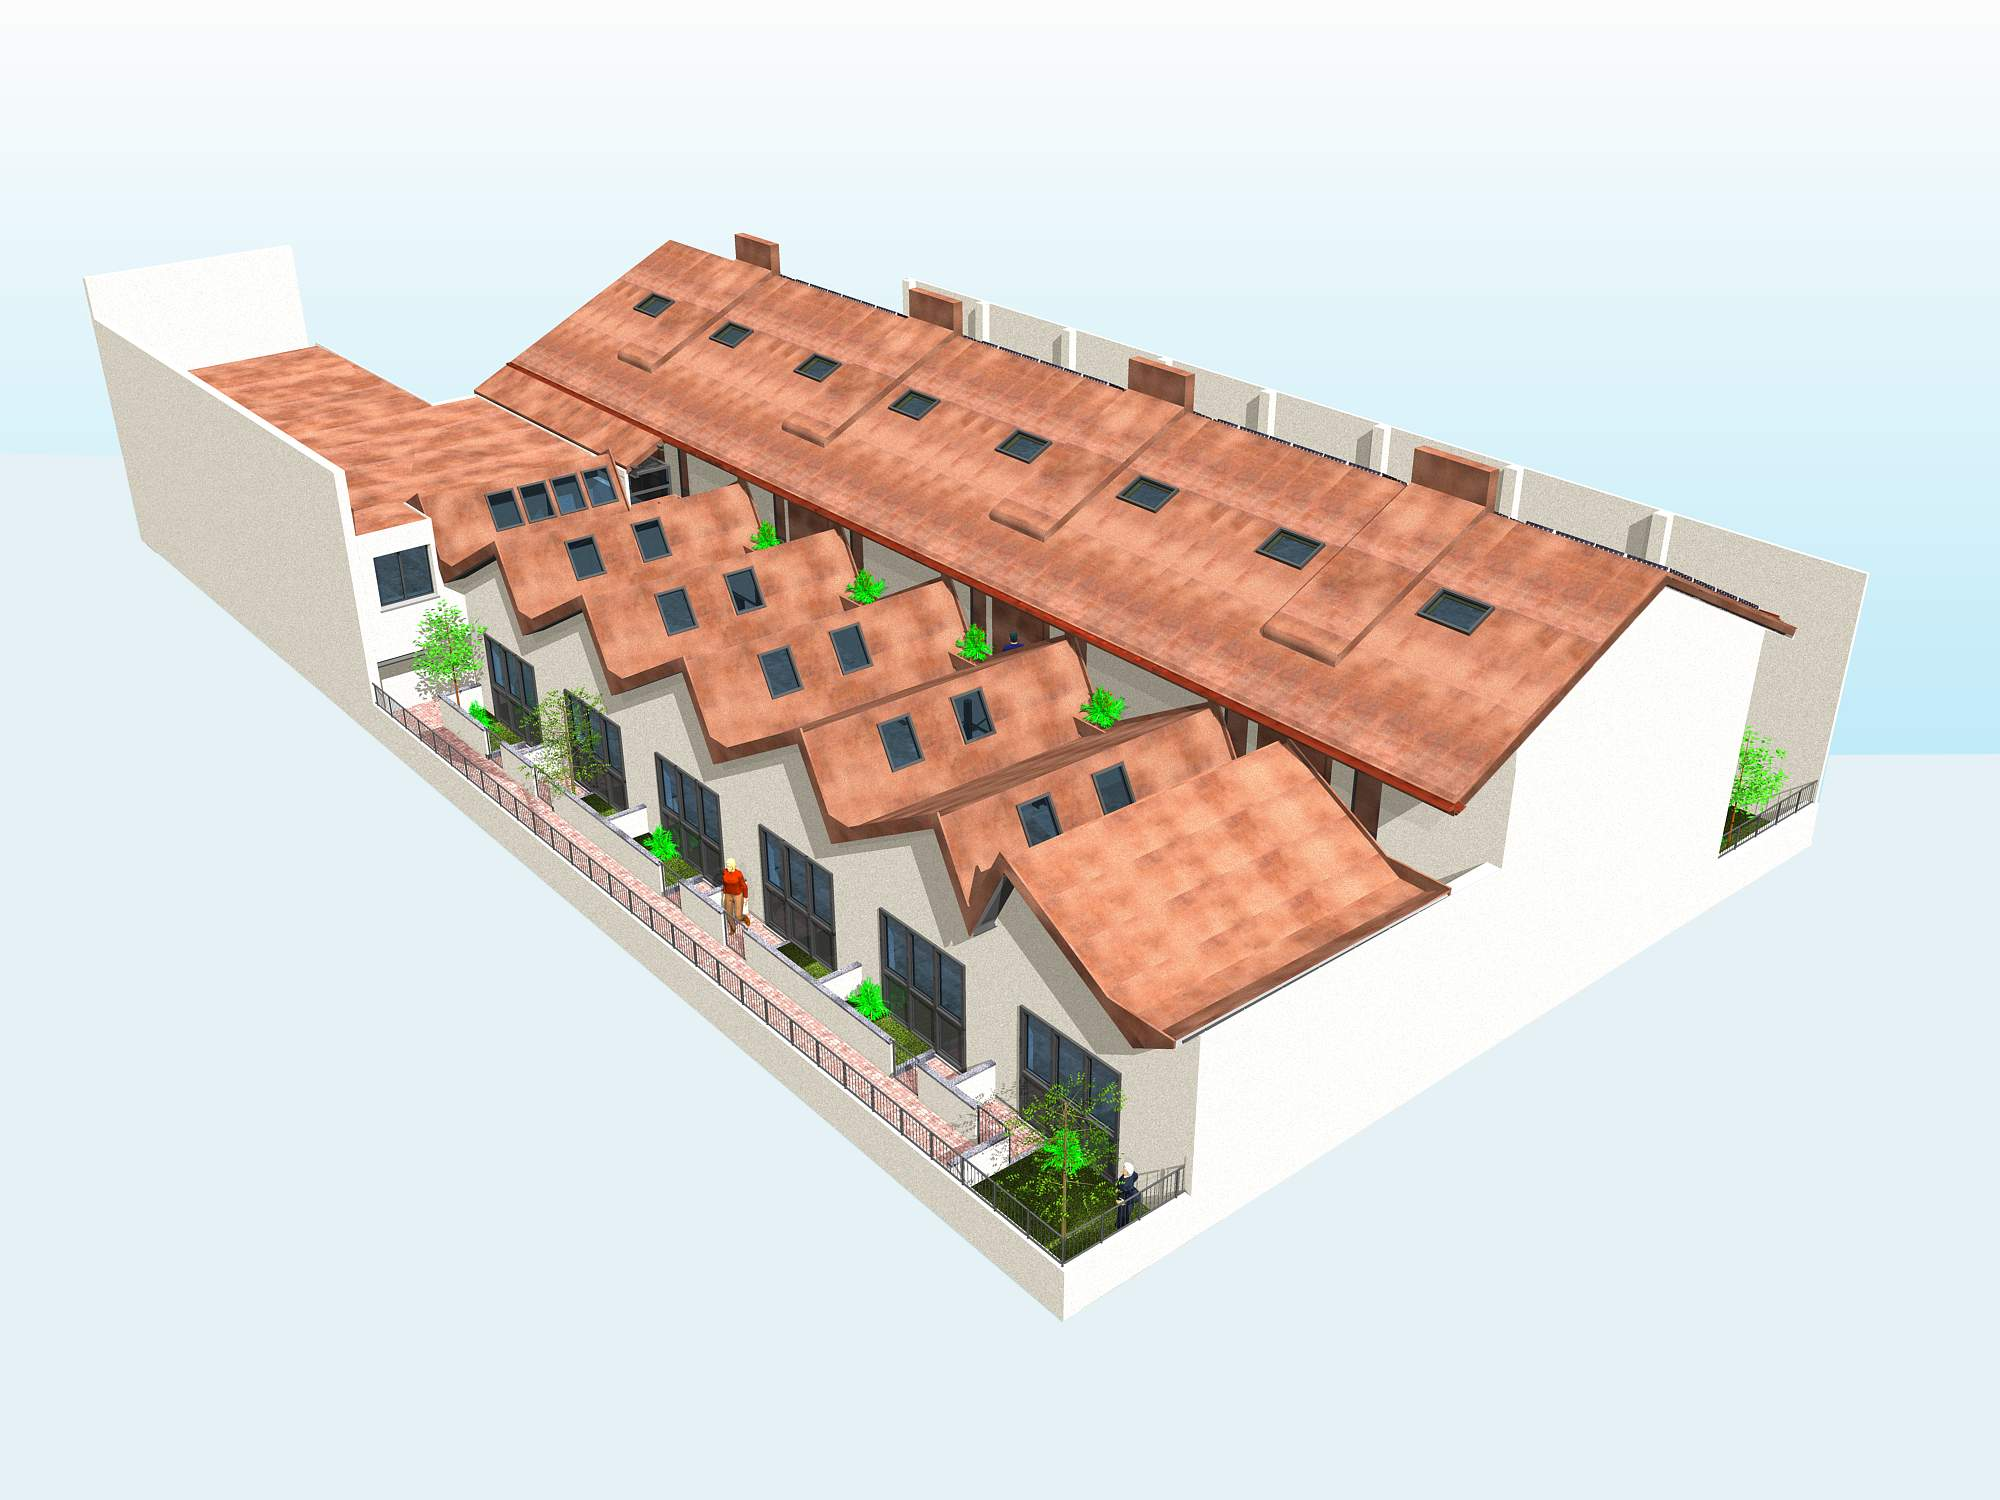 co-housing xlam acciaio milano